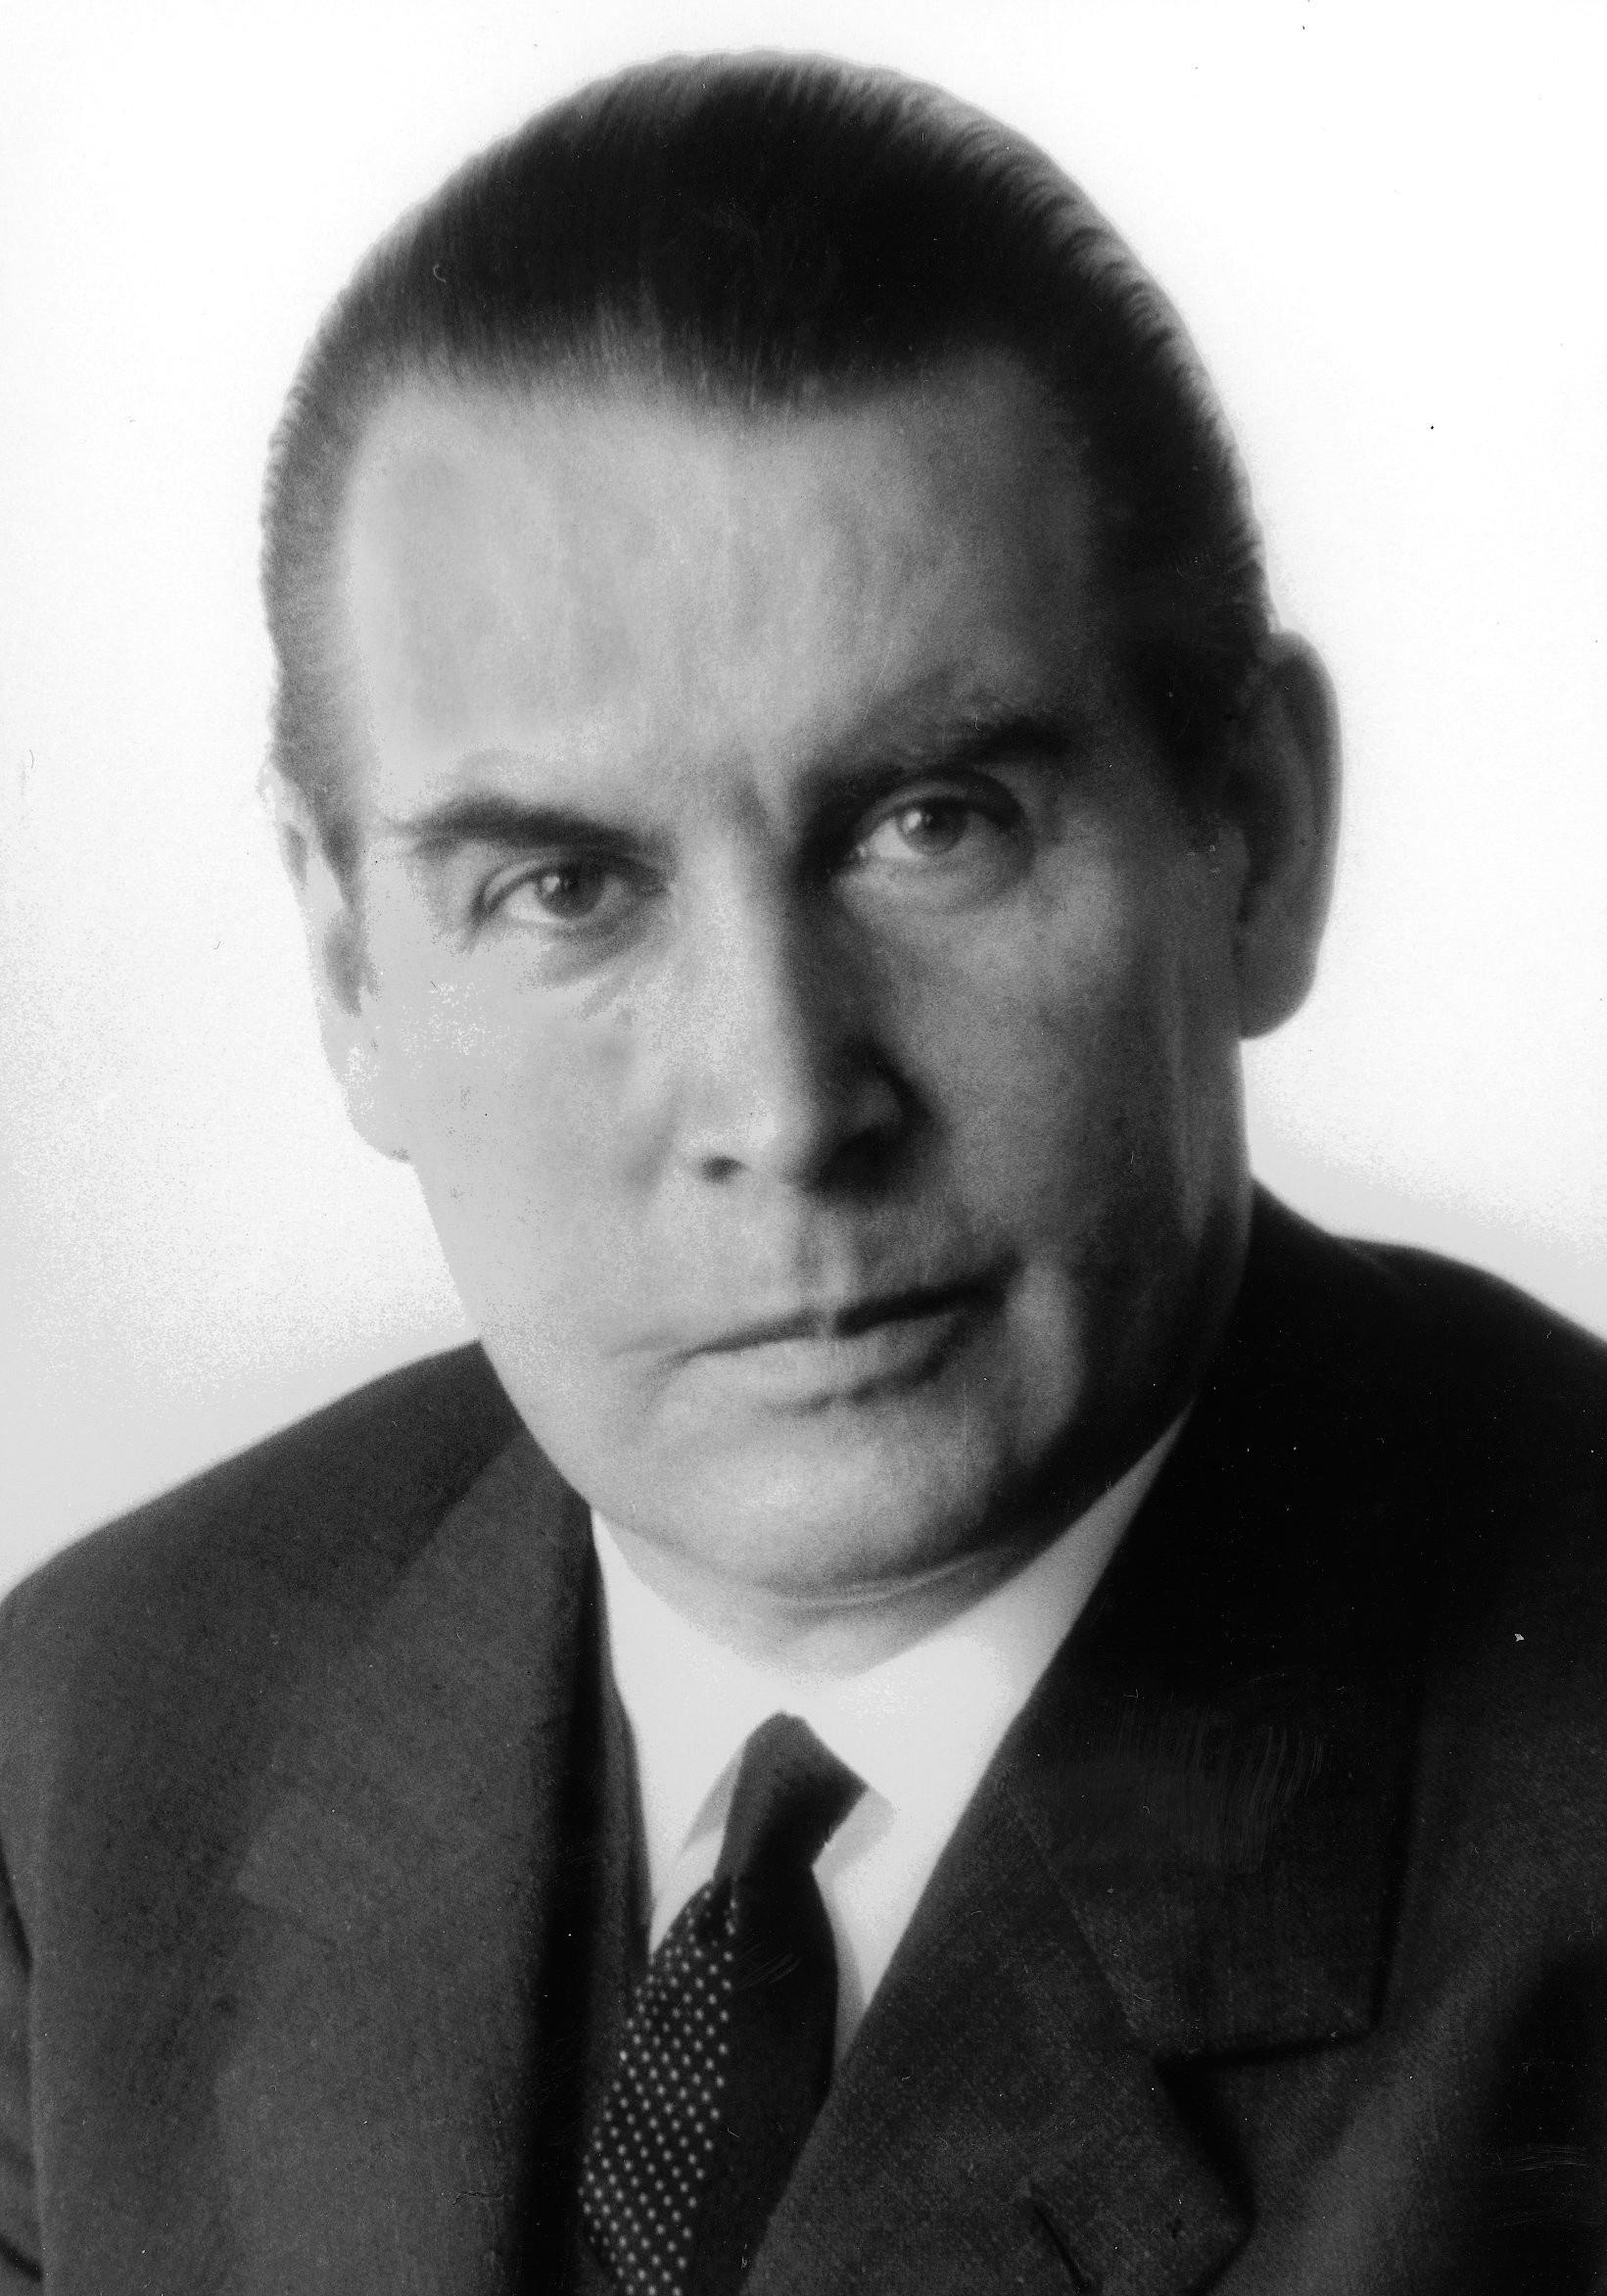 Verteidigungsminister Dr. Gerhard Schröder (4909218775).jpg